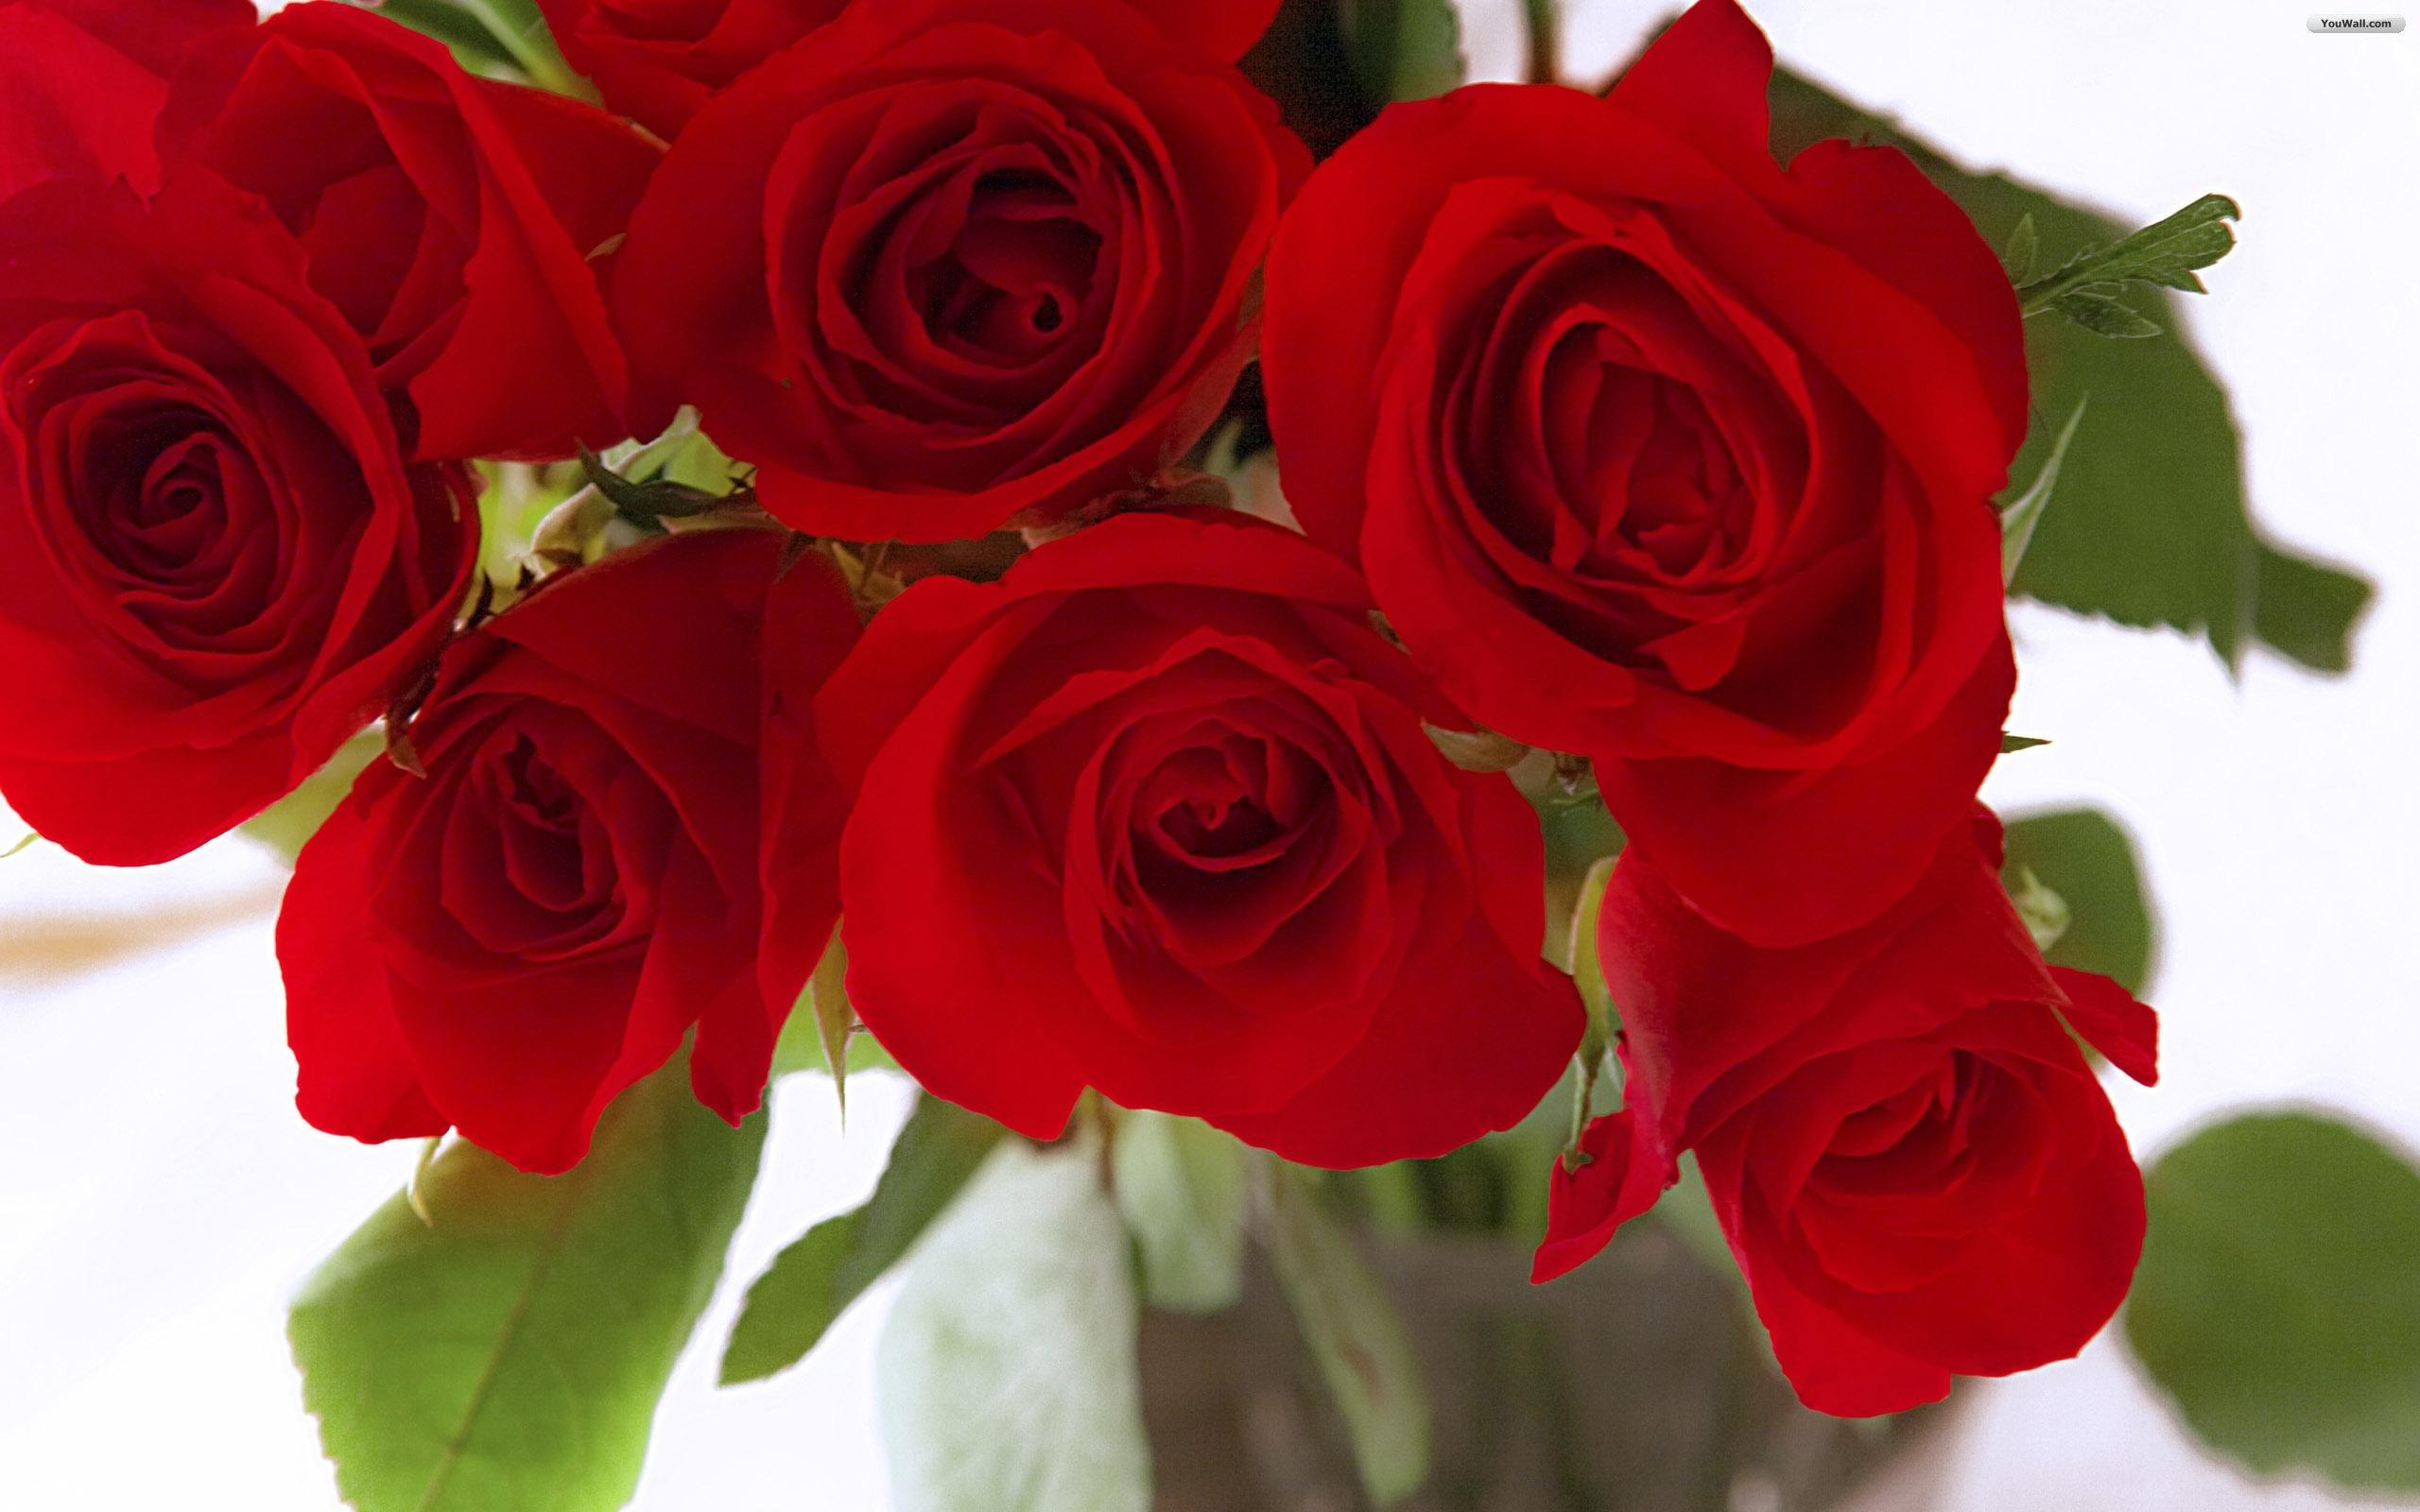 Red Roses Wallpaper